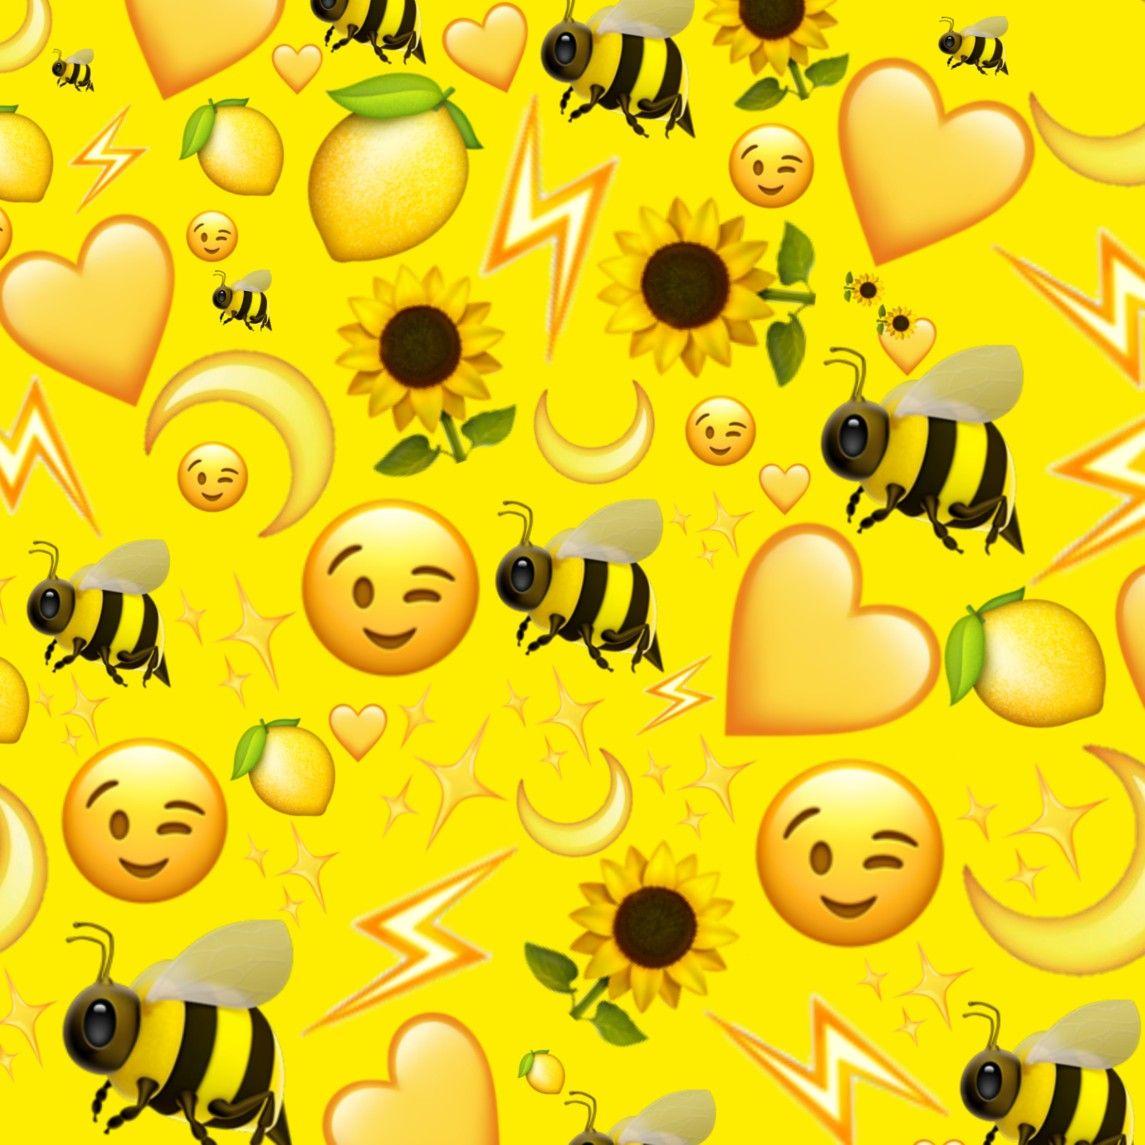 pin by brey on wallpapers emoji wallpaper emoji